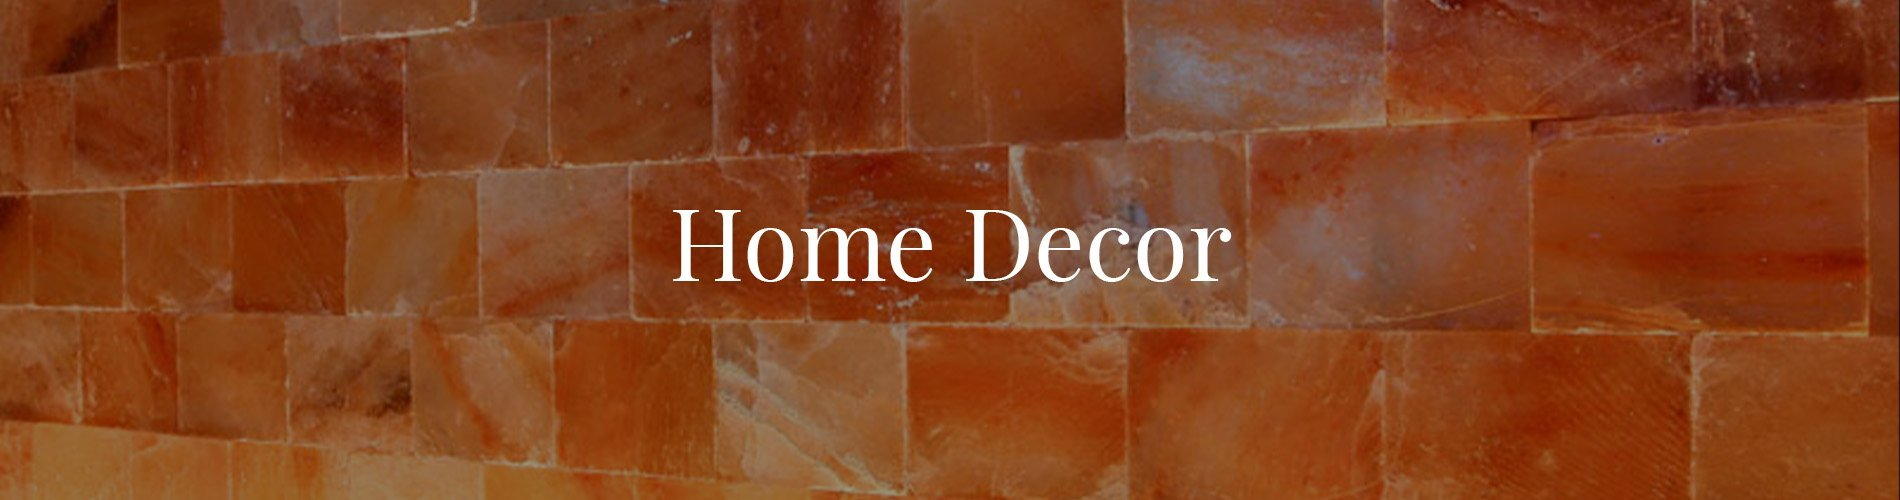 Home Decor Banner